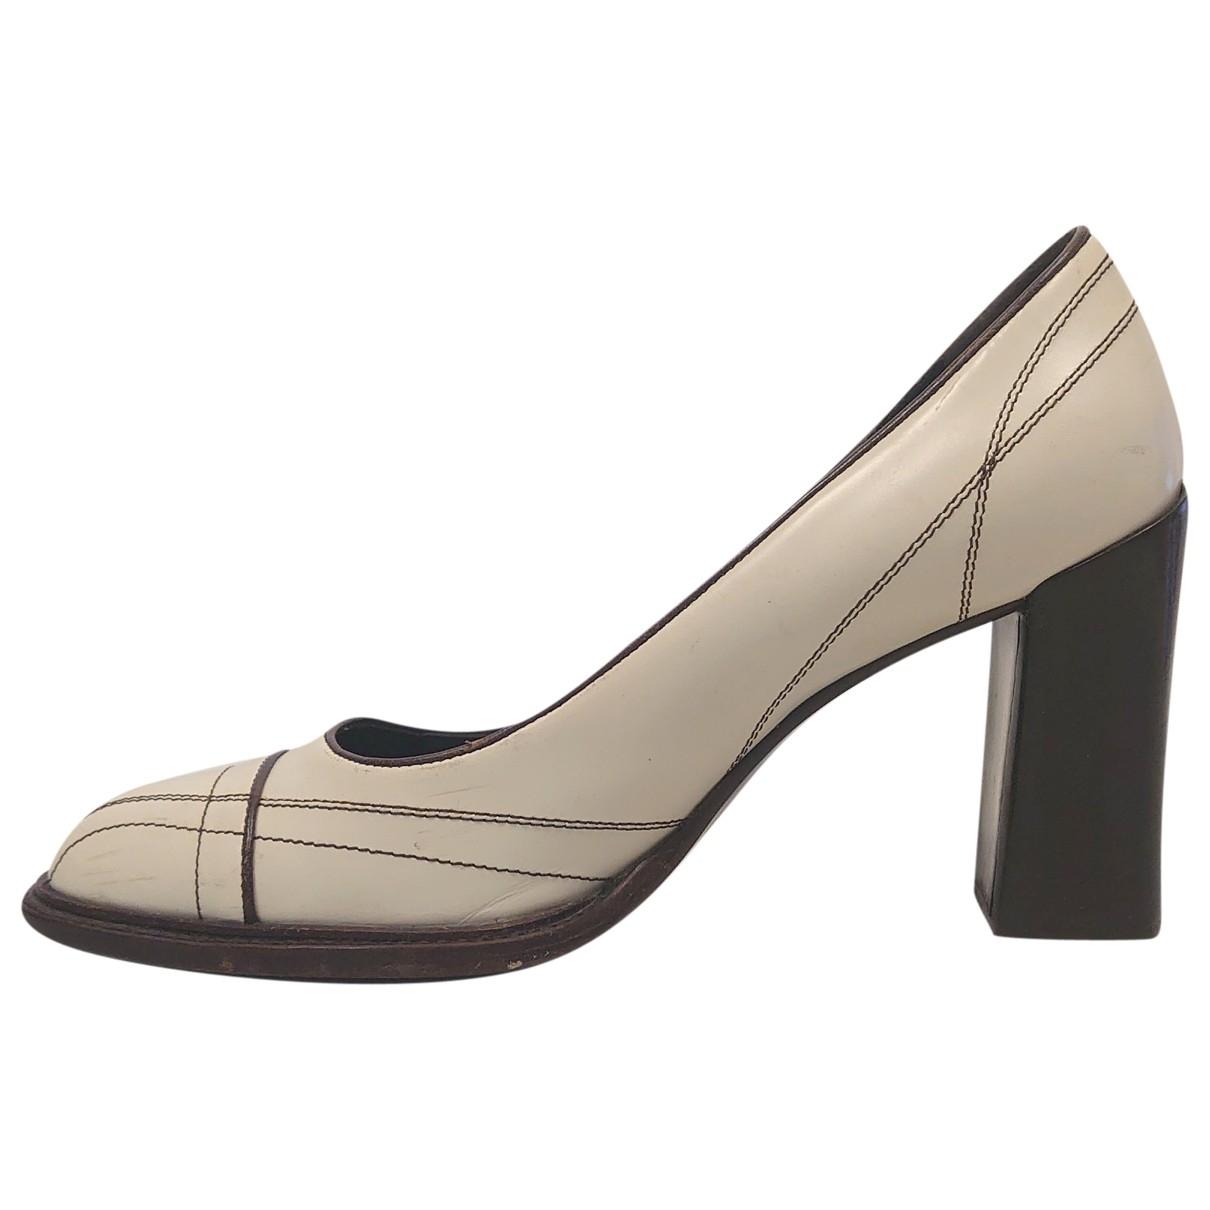 Prada \N Leather Heels for Women 35.5 IT